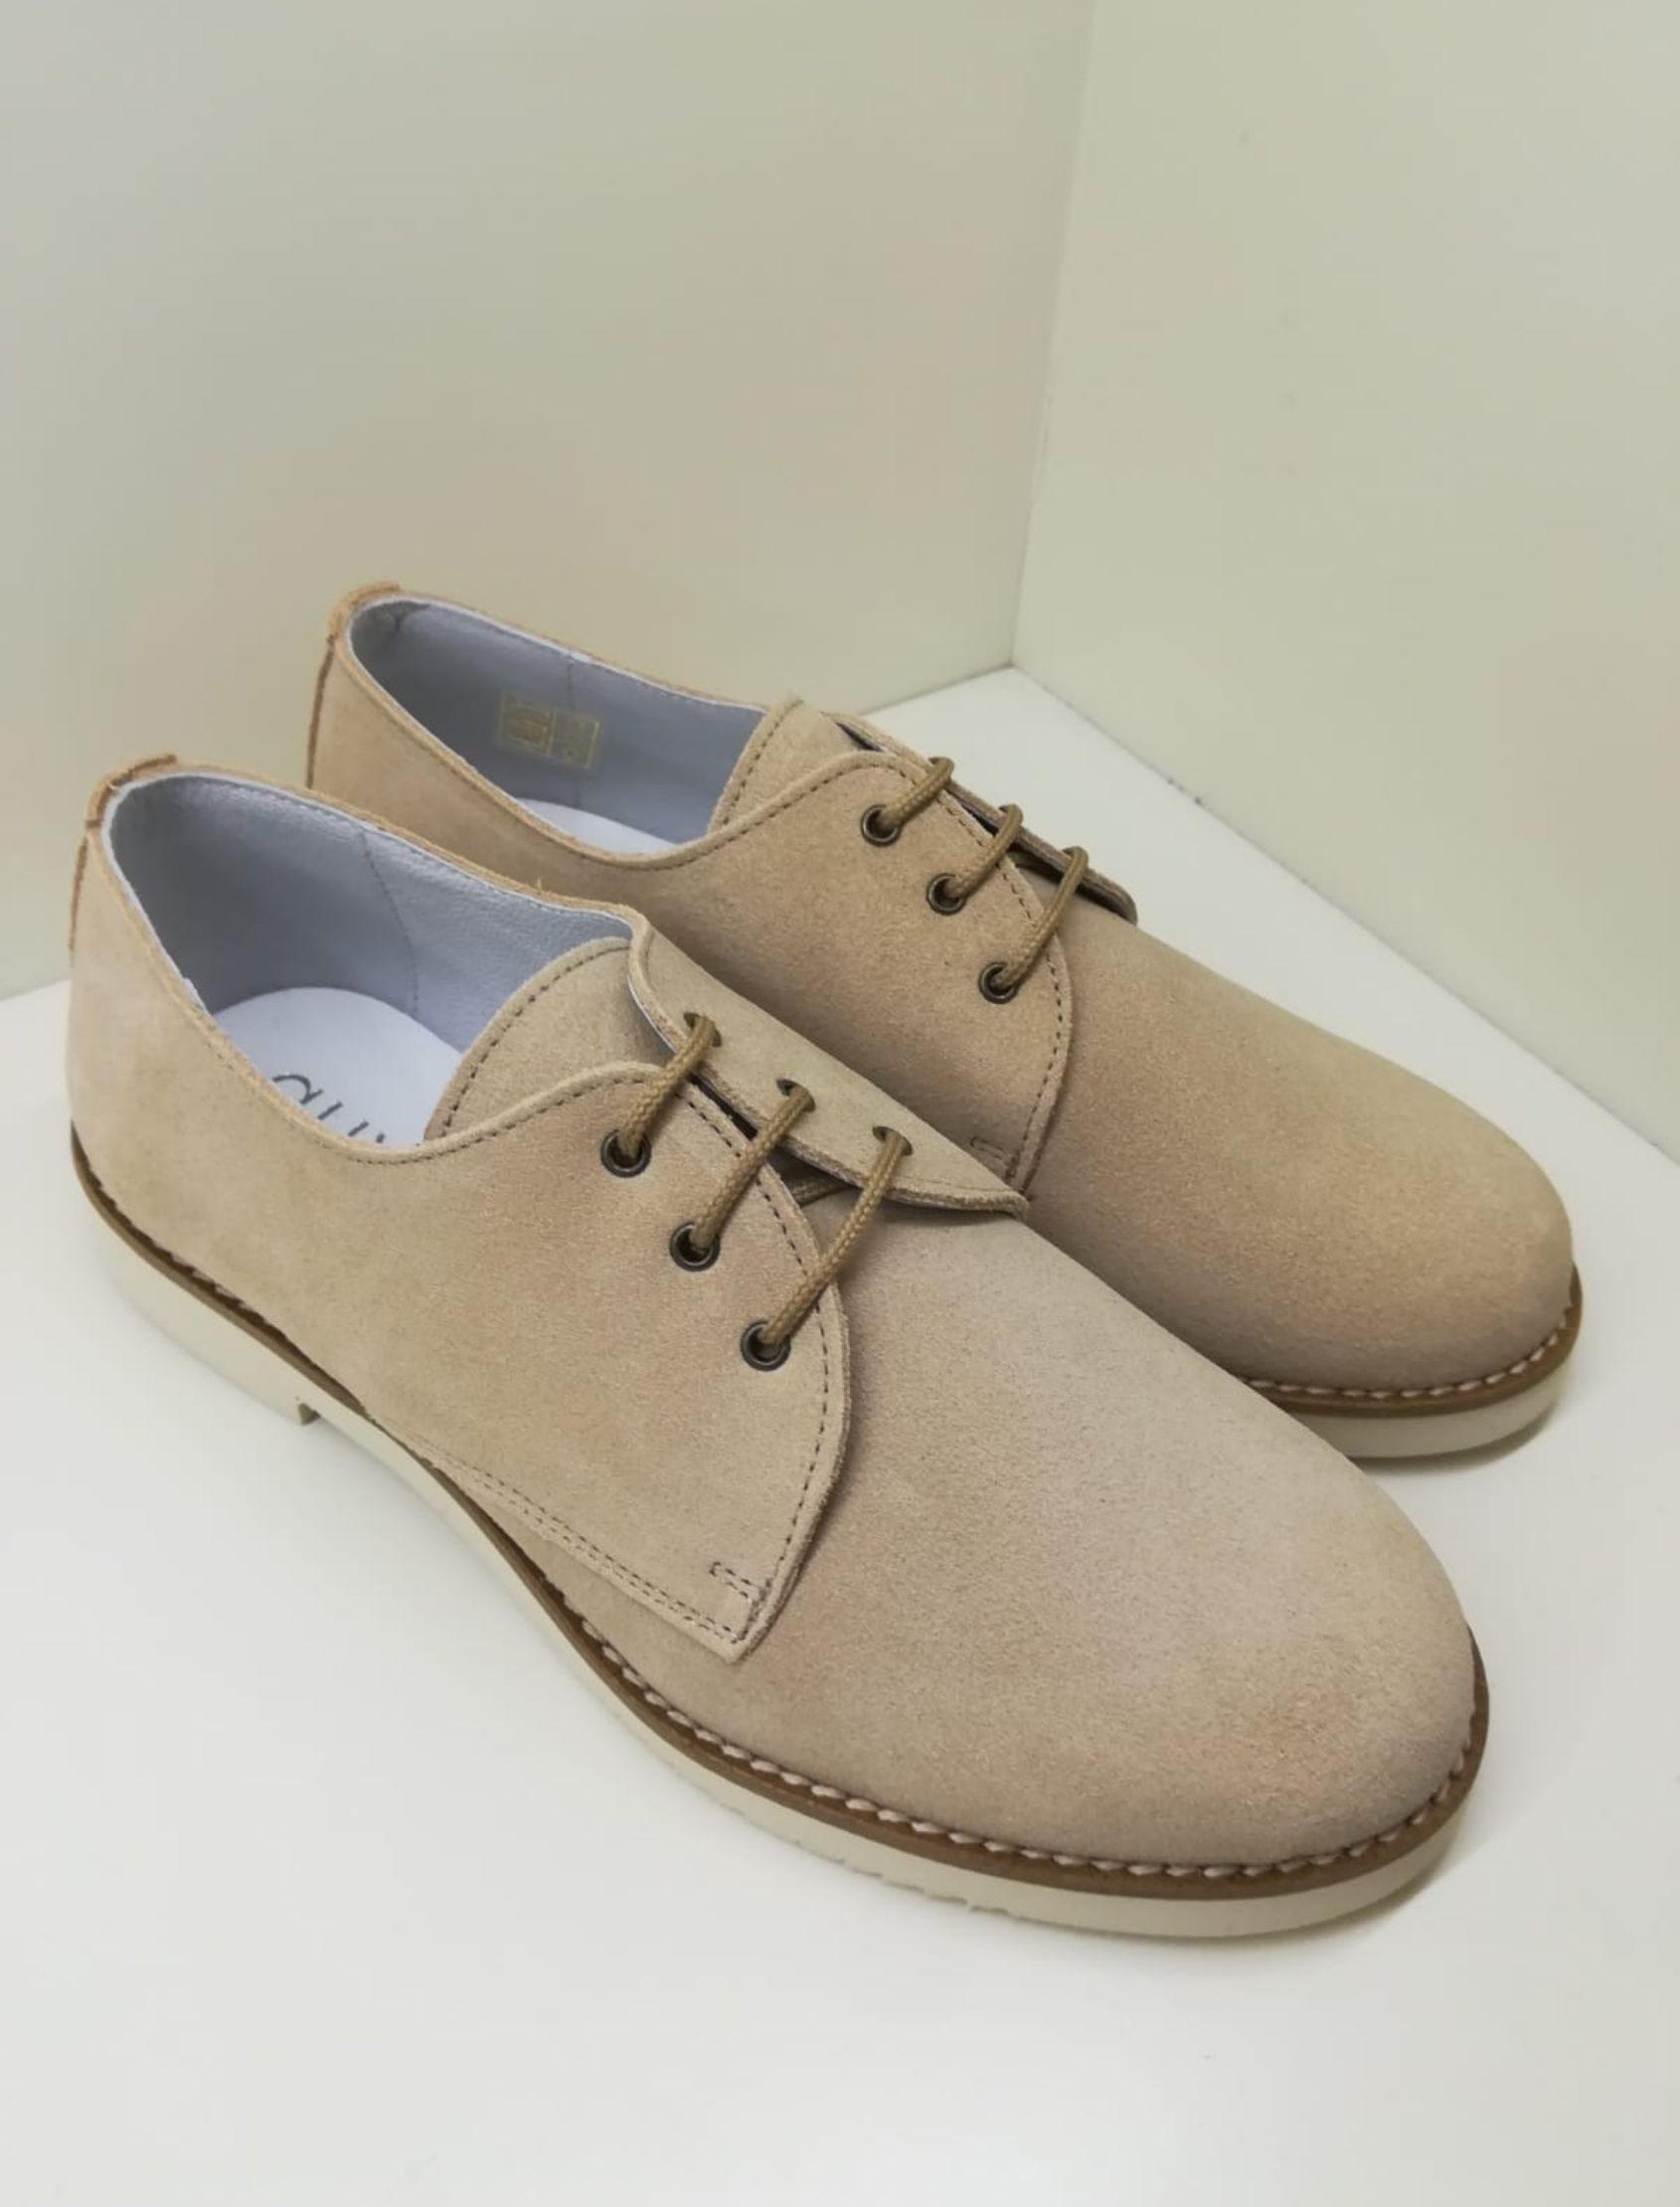 zapato estilo blucher de niño en tono arena